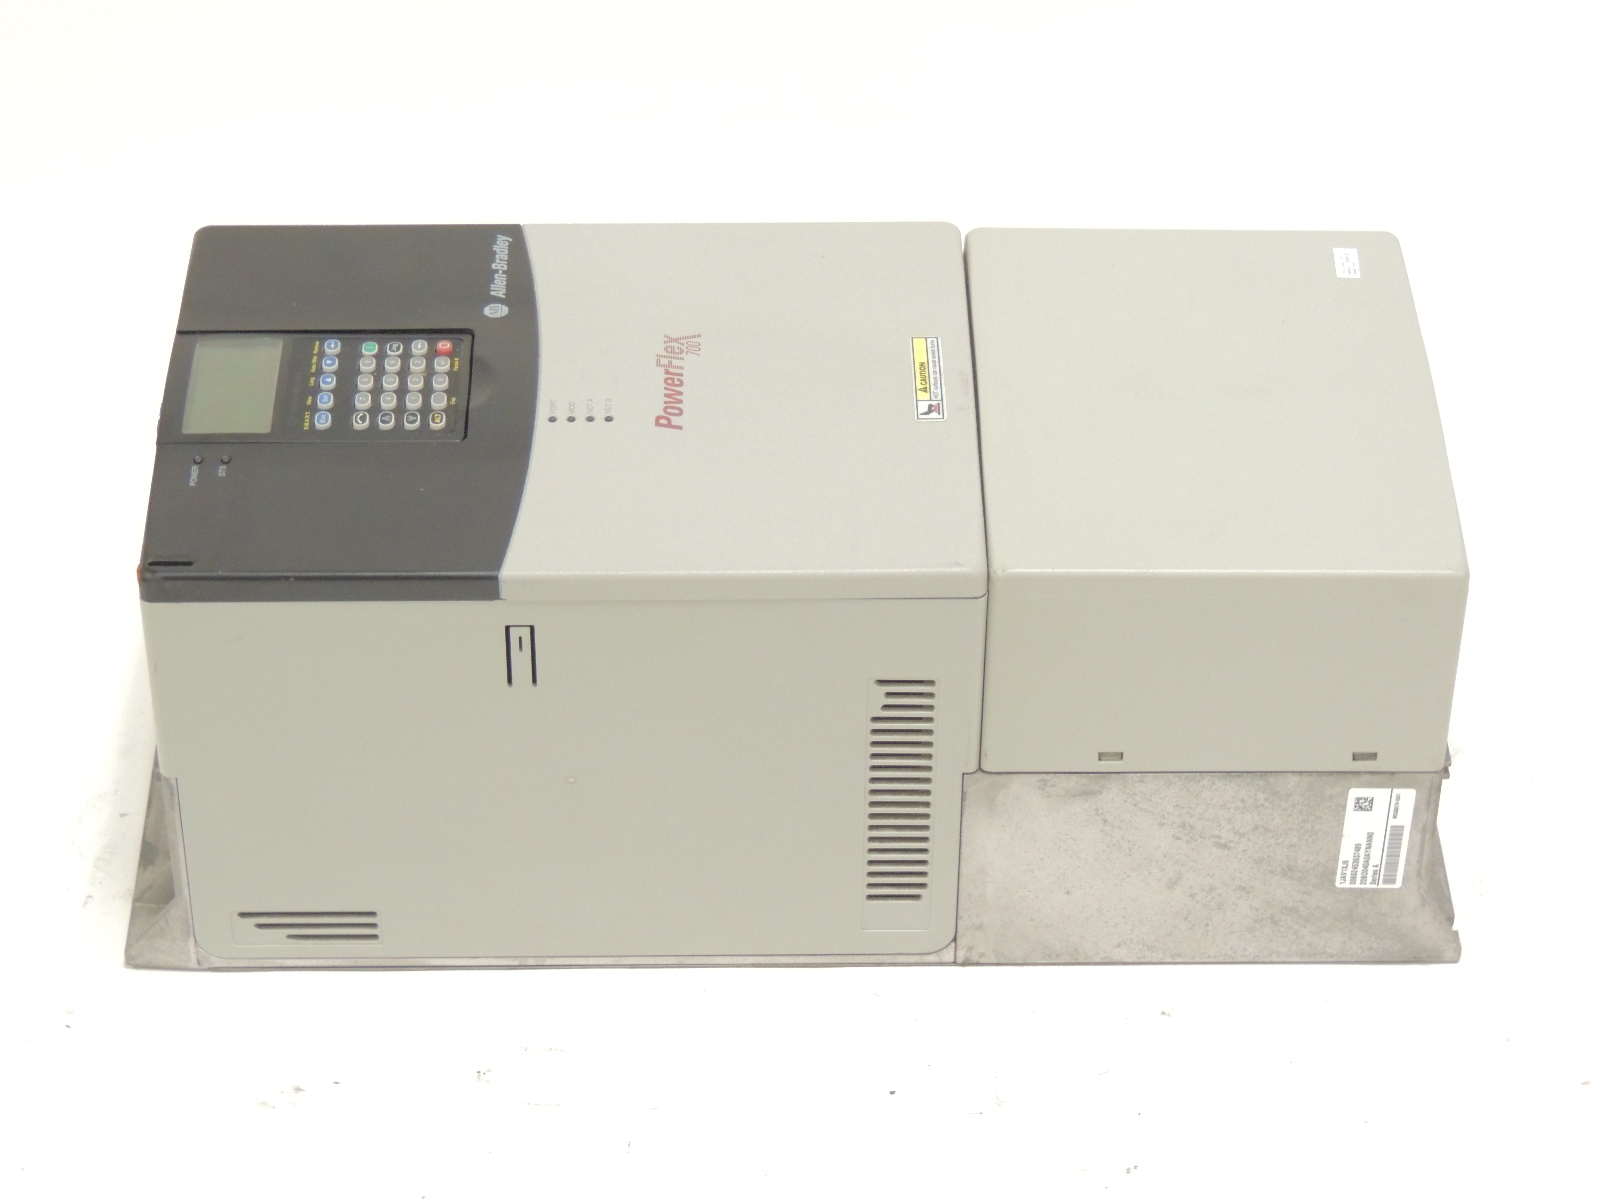 Allen Bradley Powerflex 700 Vfd 20bd040a0aynann0    20bd040a3aynann0 30hp 18m Wty